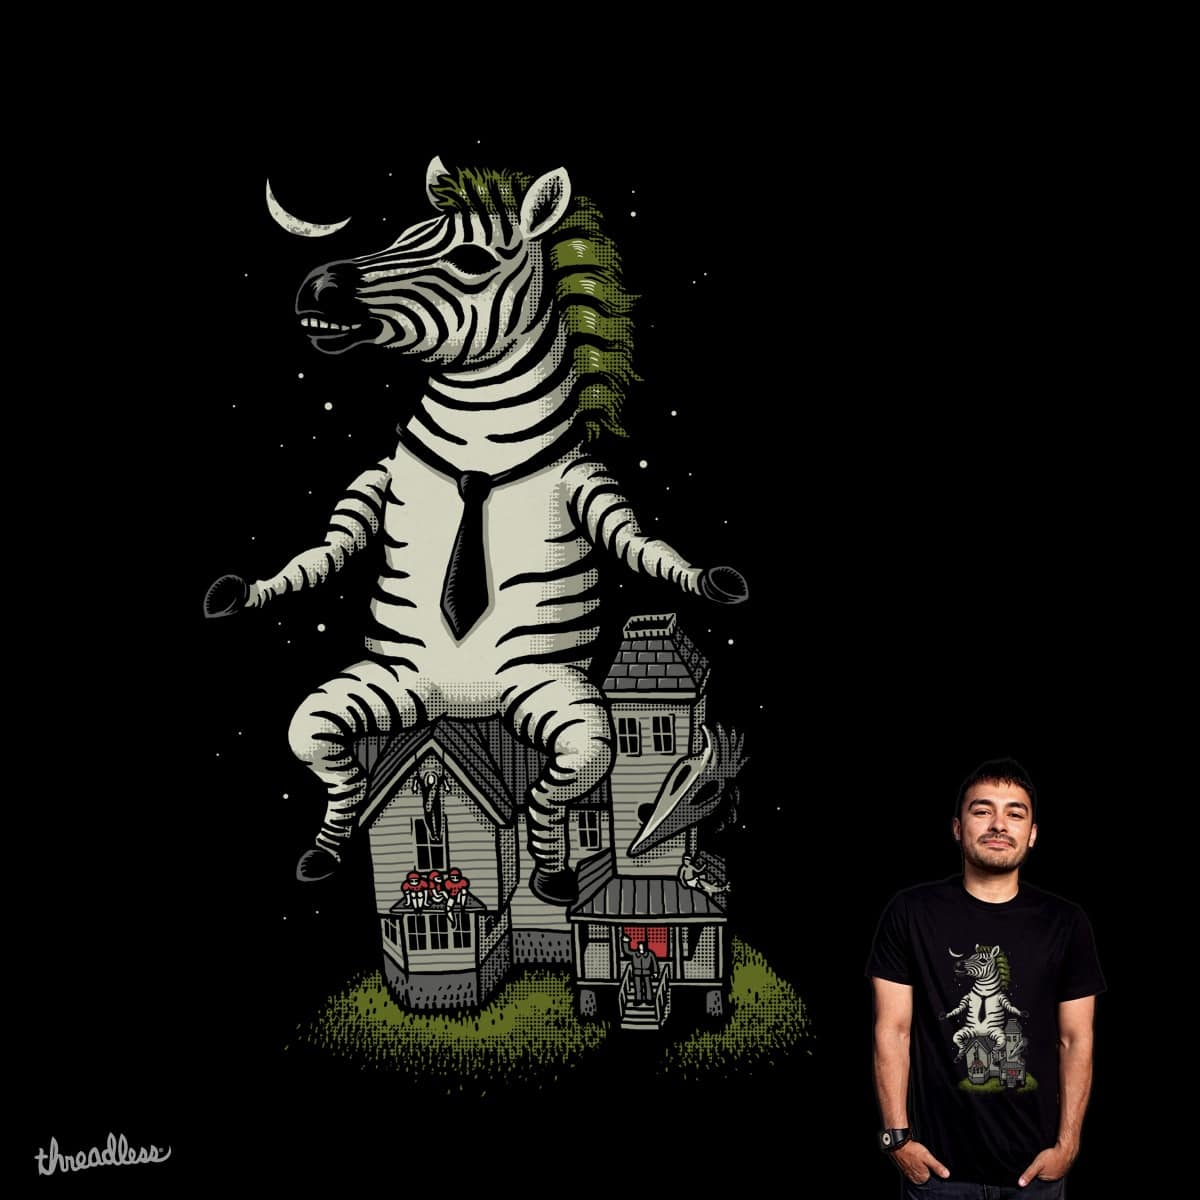 Zebra Exorcist by ben chen on Threadless